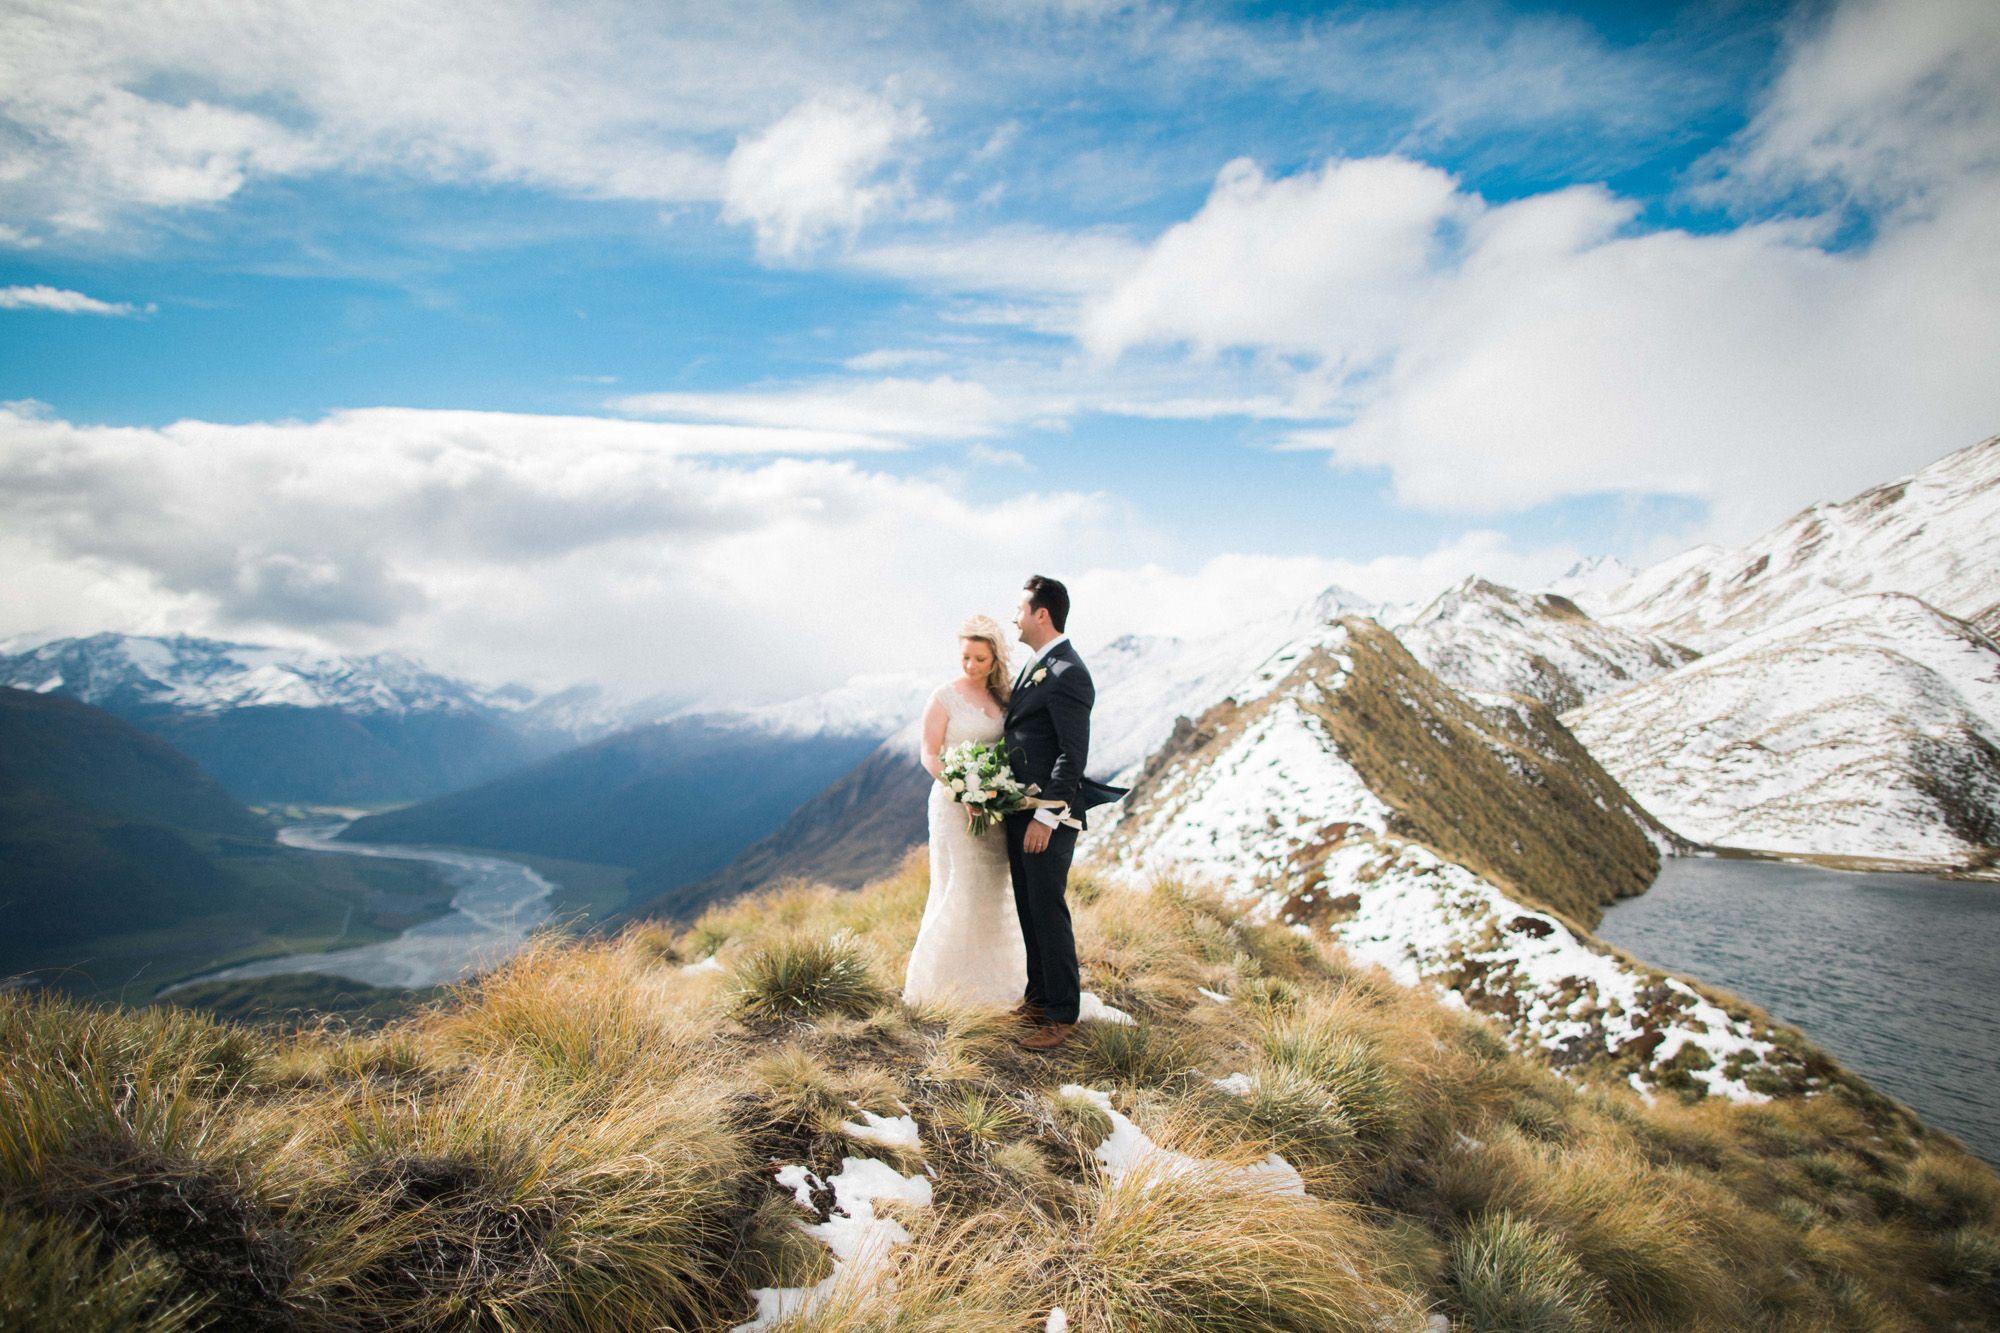 weddingwednesday Southern Alps Elopement Photography